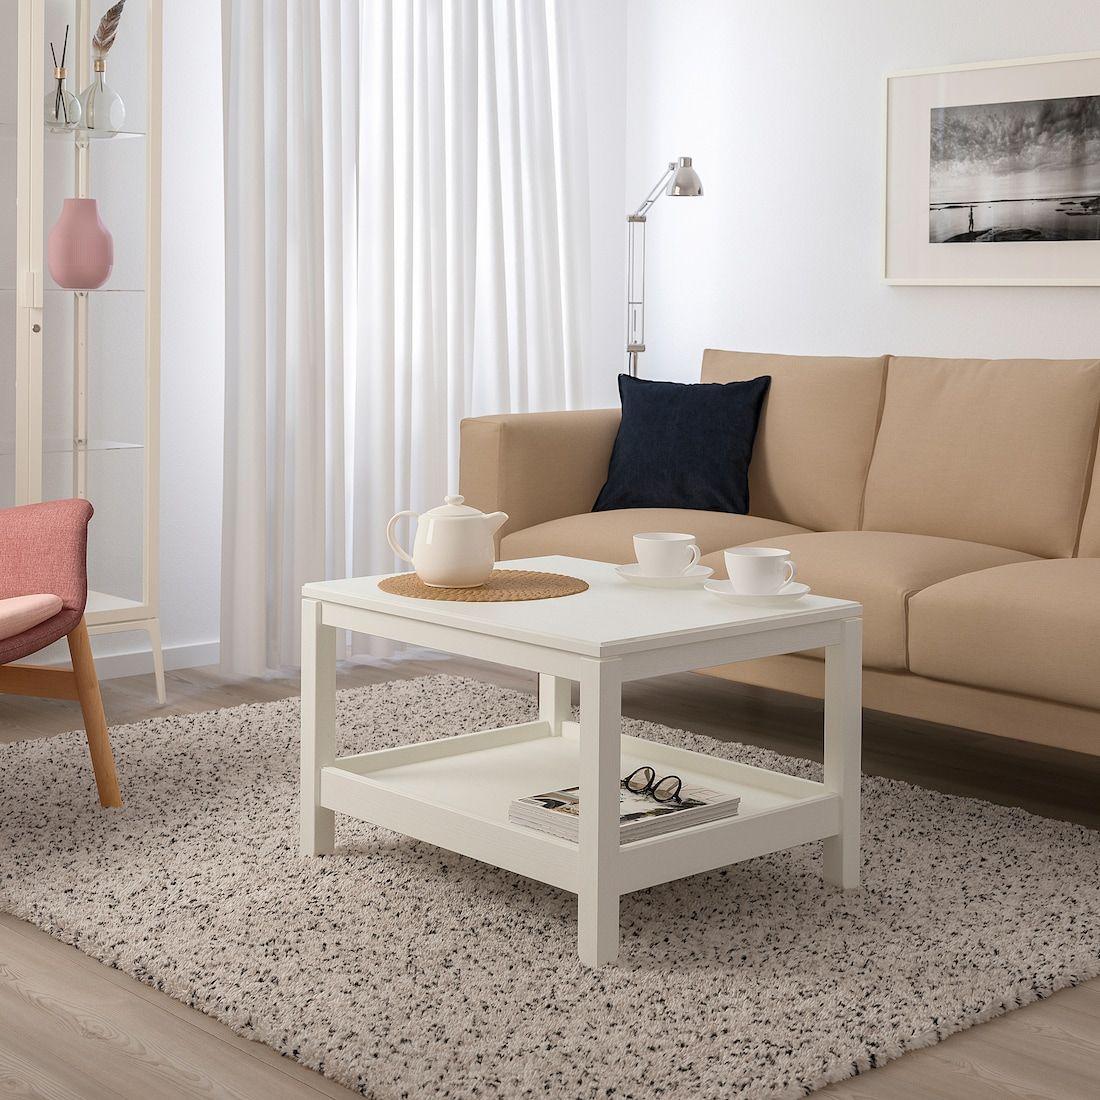 HAVSTA Coffee table white (CA) IKEA in 2020 Coffee